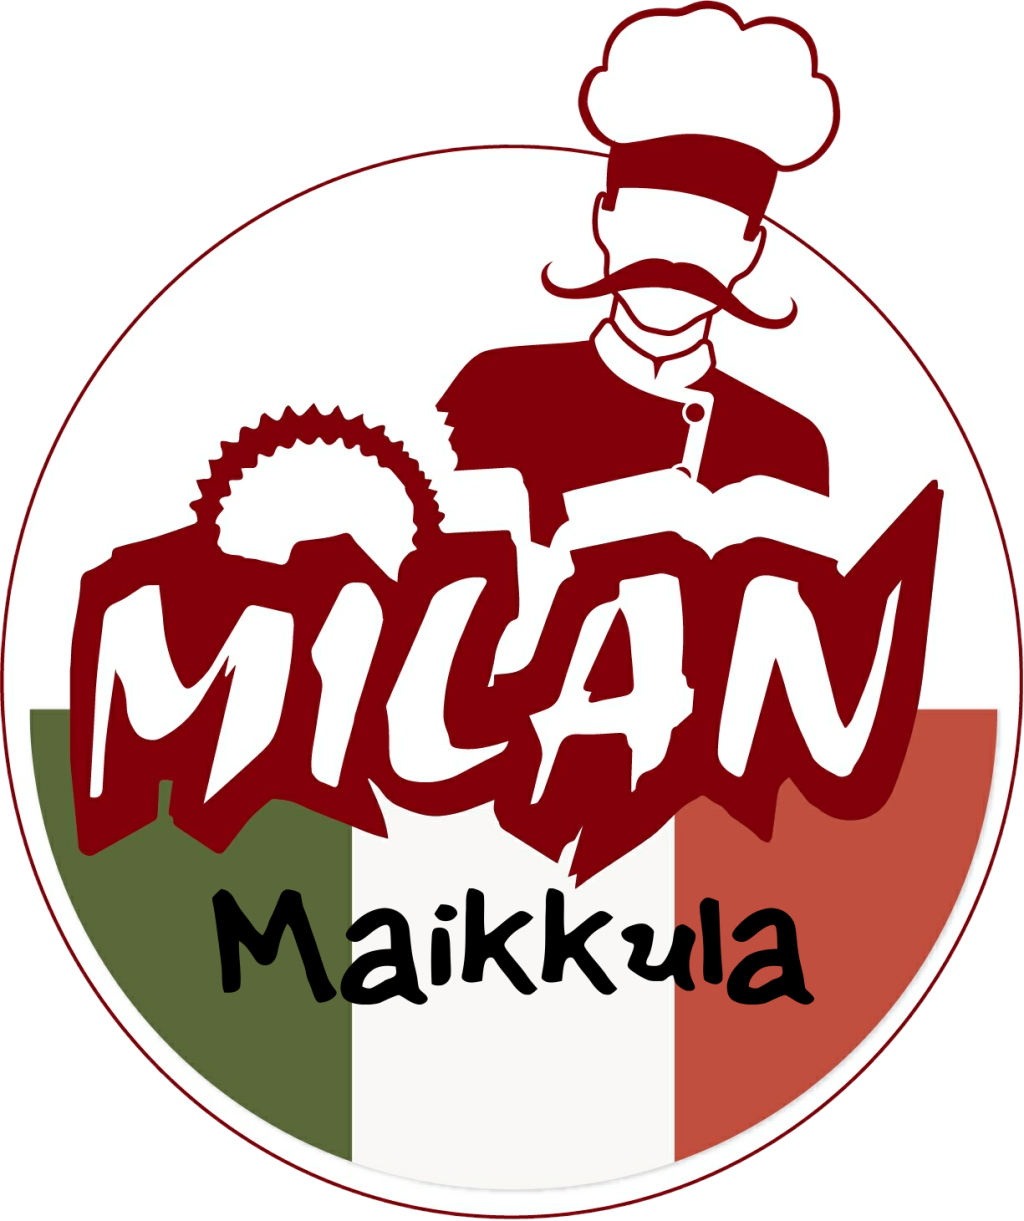 Pizzeria Milan Maikkula